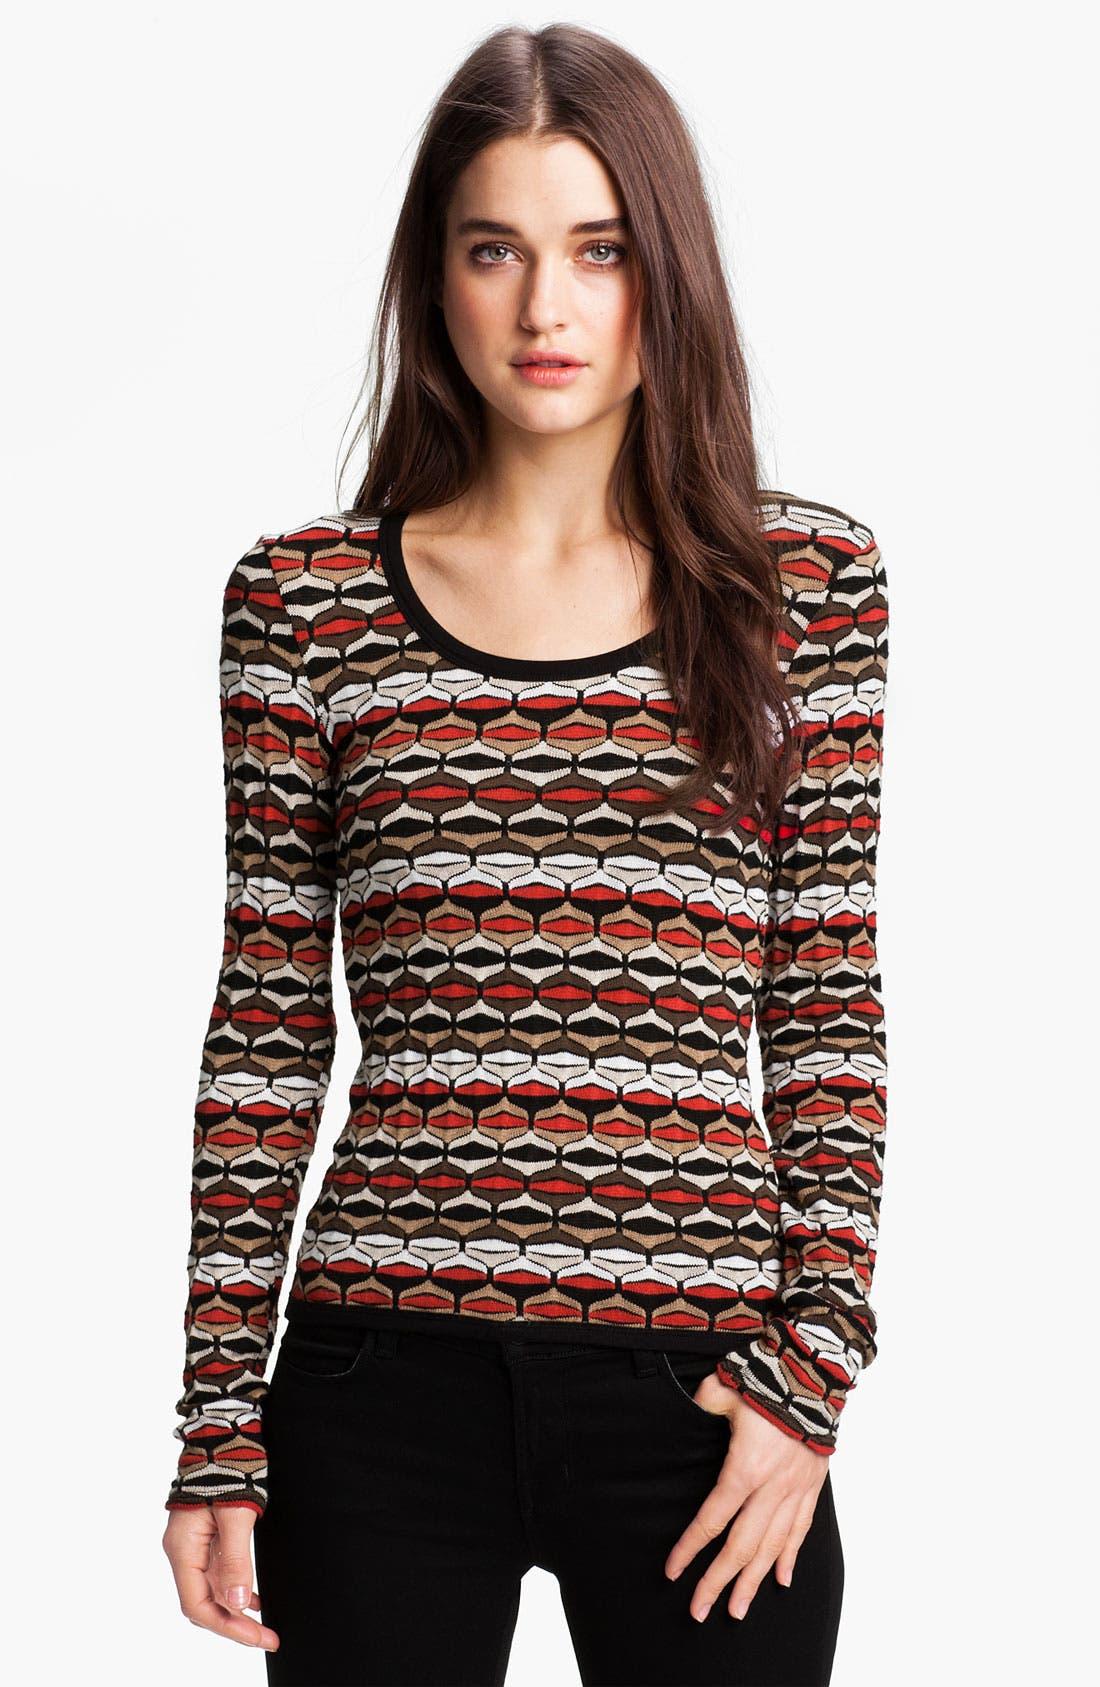 Alternate Image 1 Selected - Bailey 44 Retro Motif Sweater